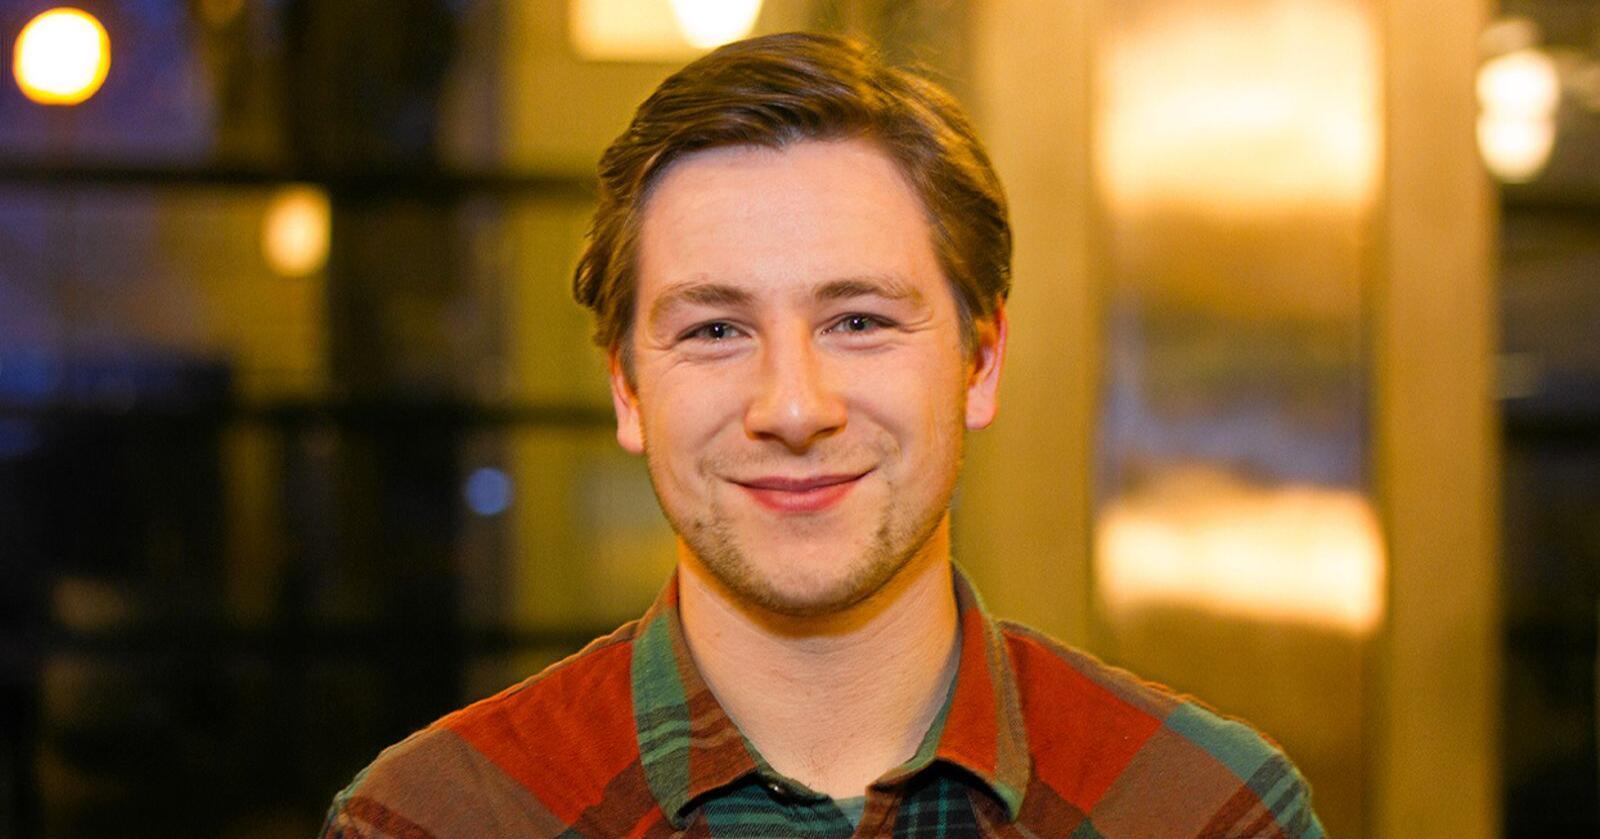 Vi trenger politiske tiltak som styrker selvforsyningsgraden, skriver Andreas Sjalg Unneland. Foto: Sosialistisk Ungdom